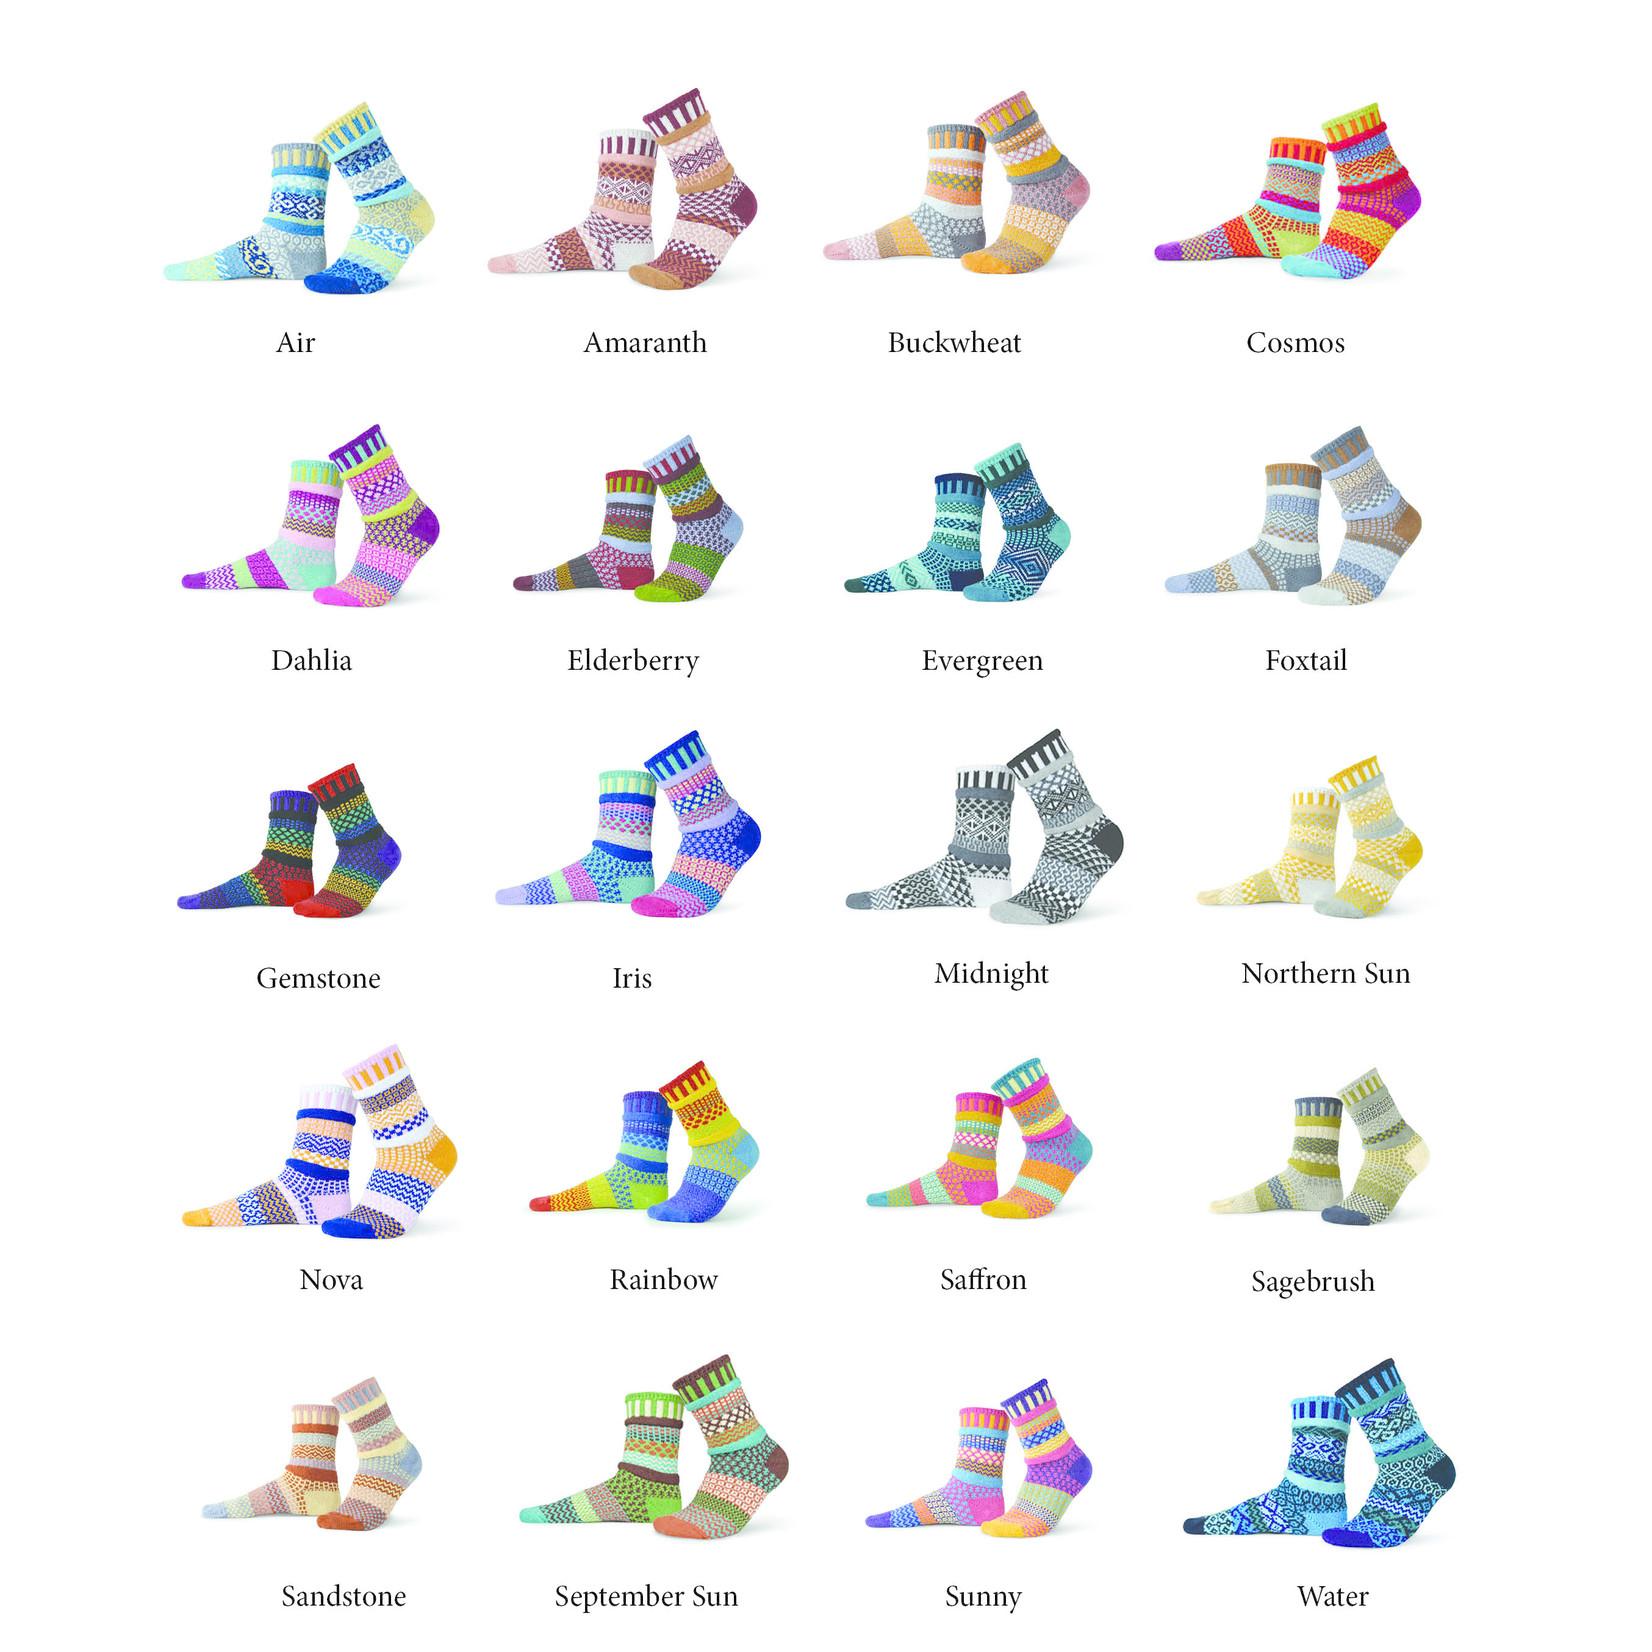 Solmate Crew Socks